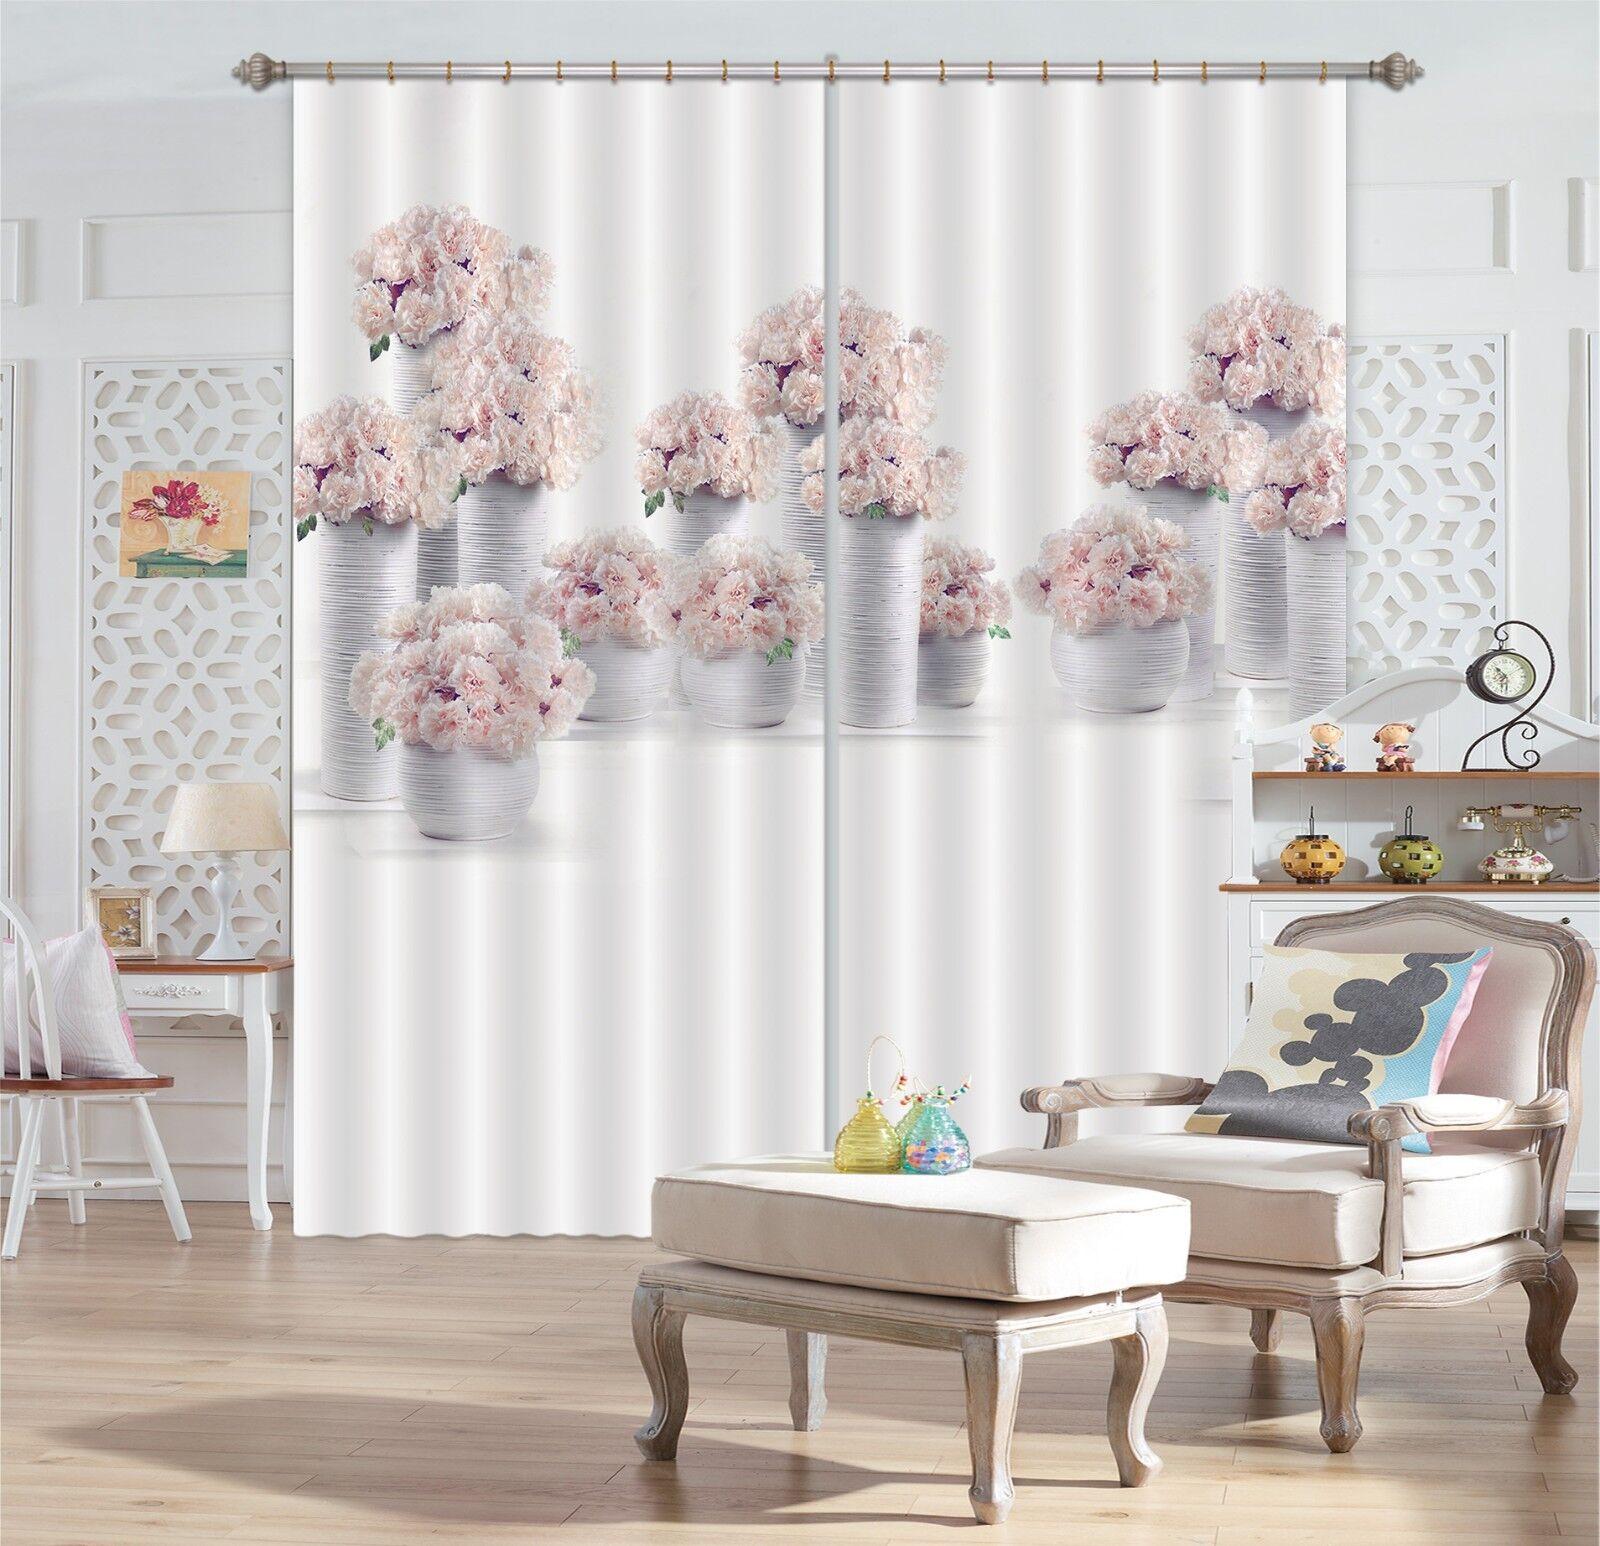 3D blanco vase 6 Blockout Photo Curtain Printing Curtains Drapes Fabric Window AU